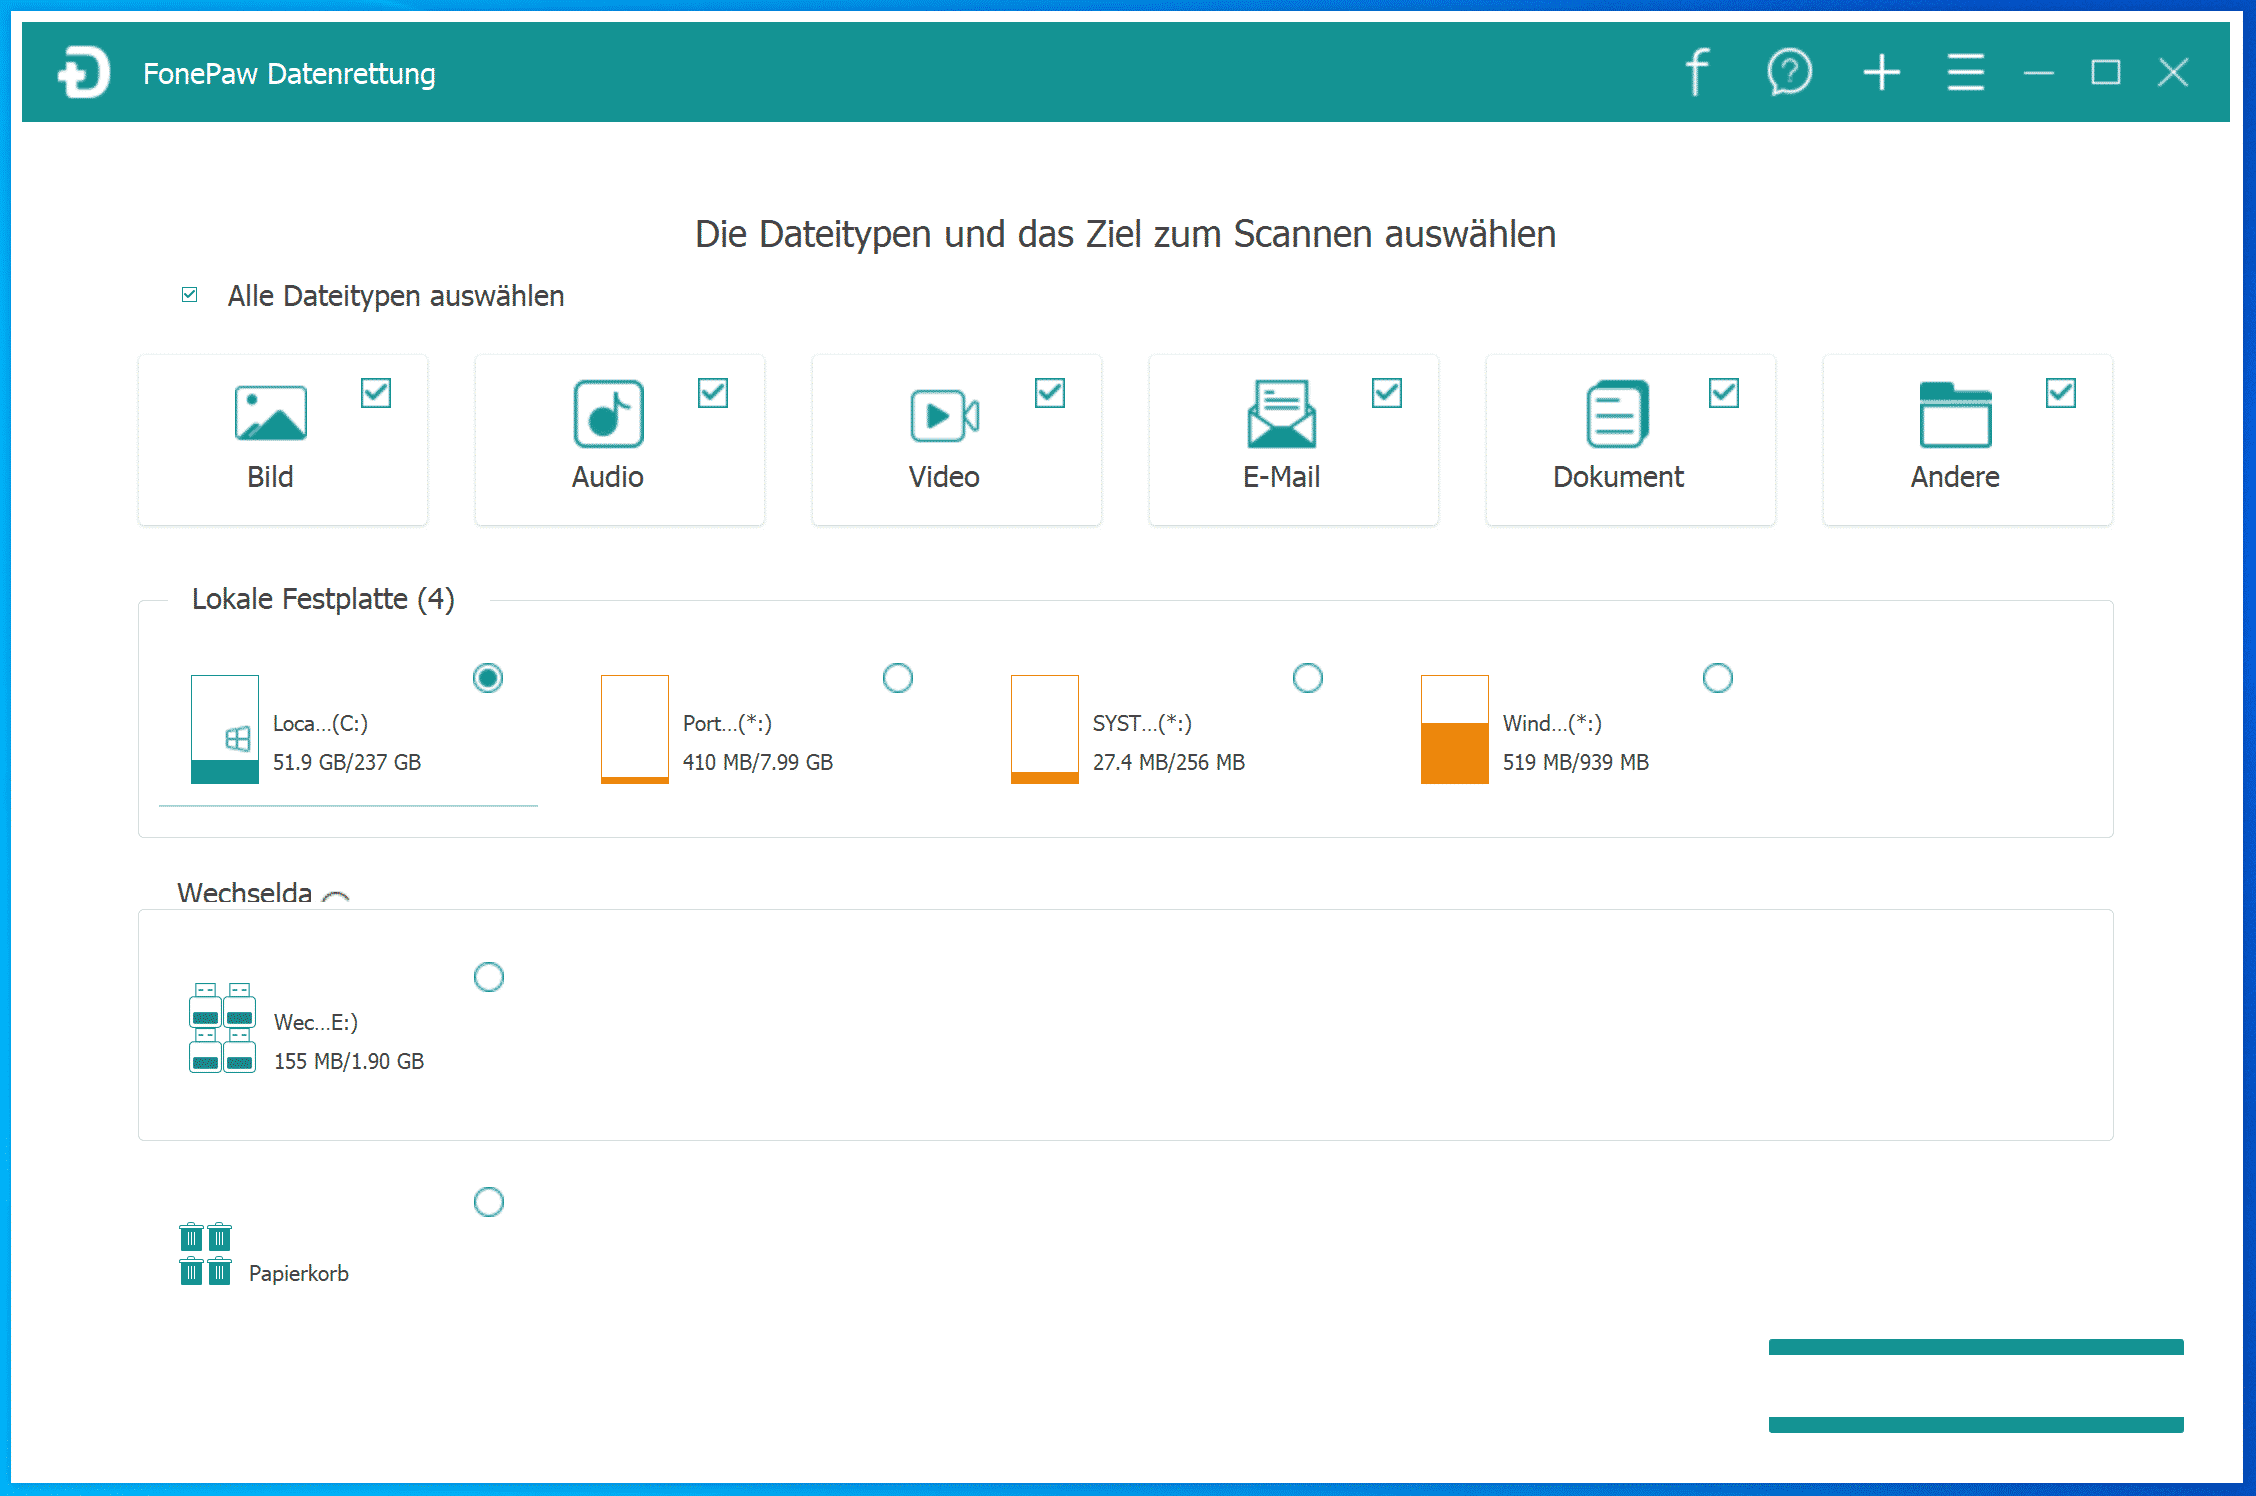 FonePaw Datenrettung